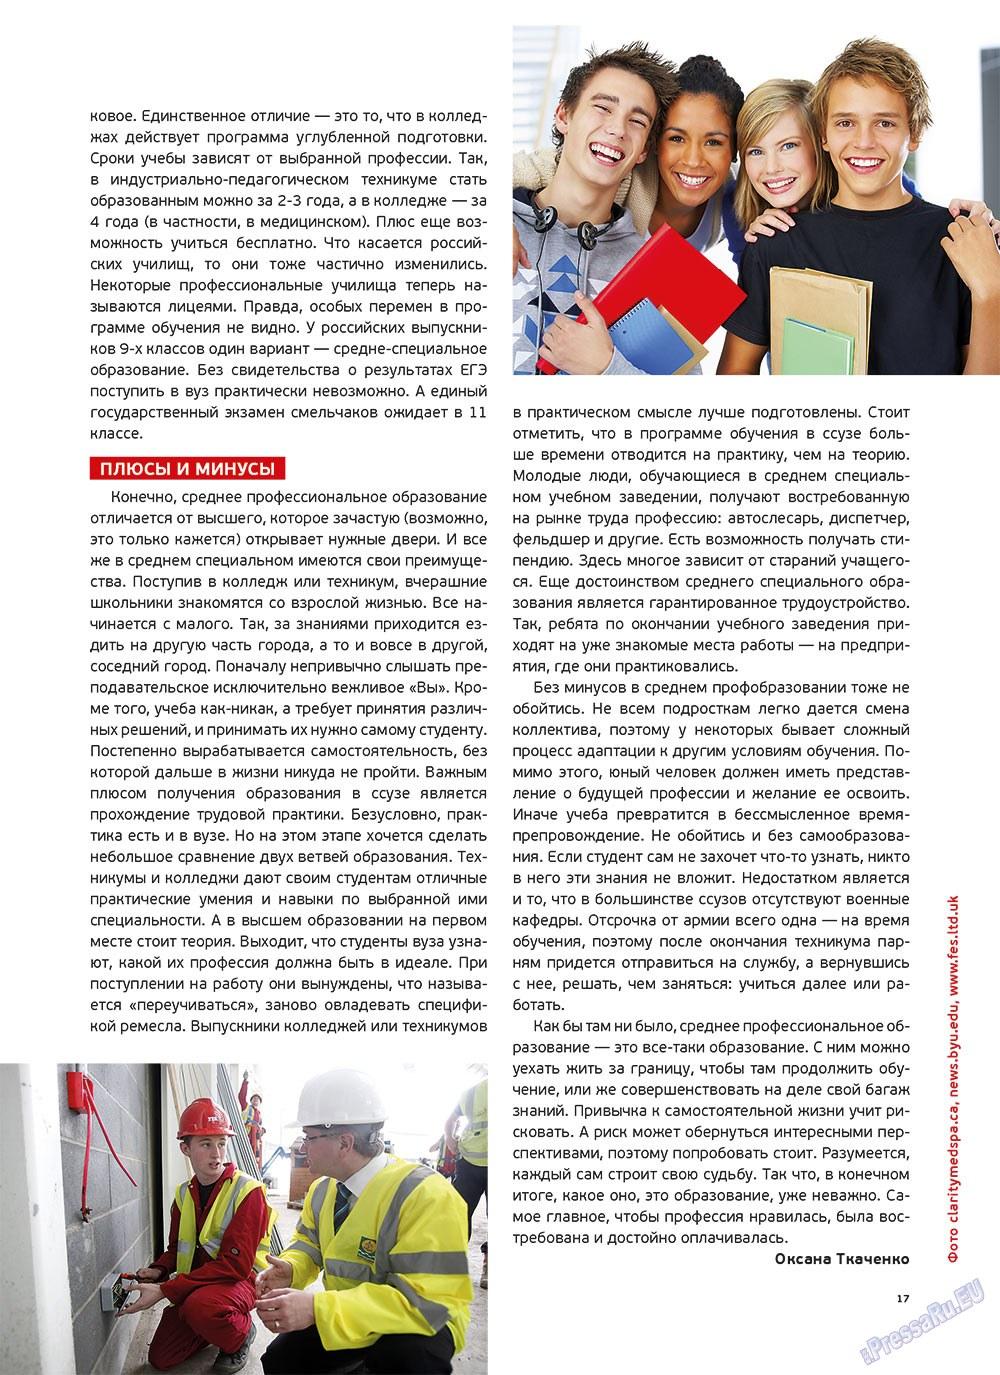 Артек (журнал). 2012 год, номер 6, стр. 19